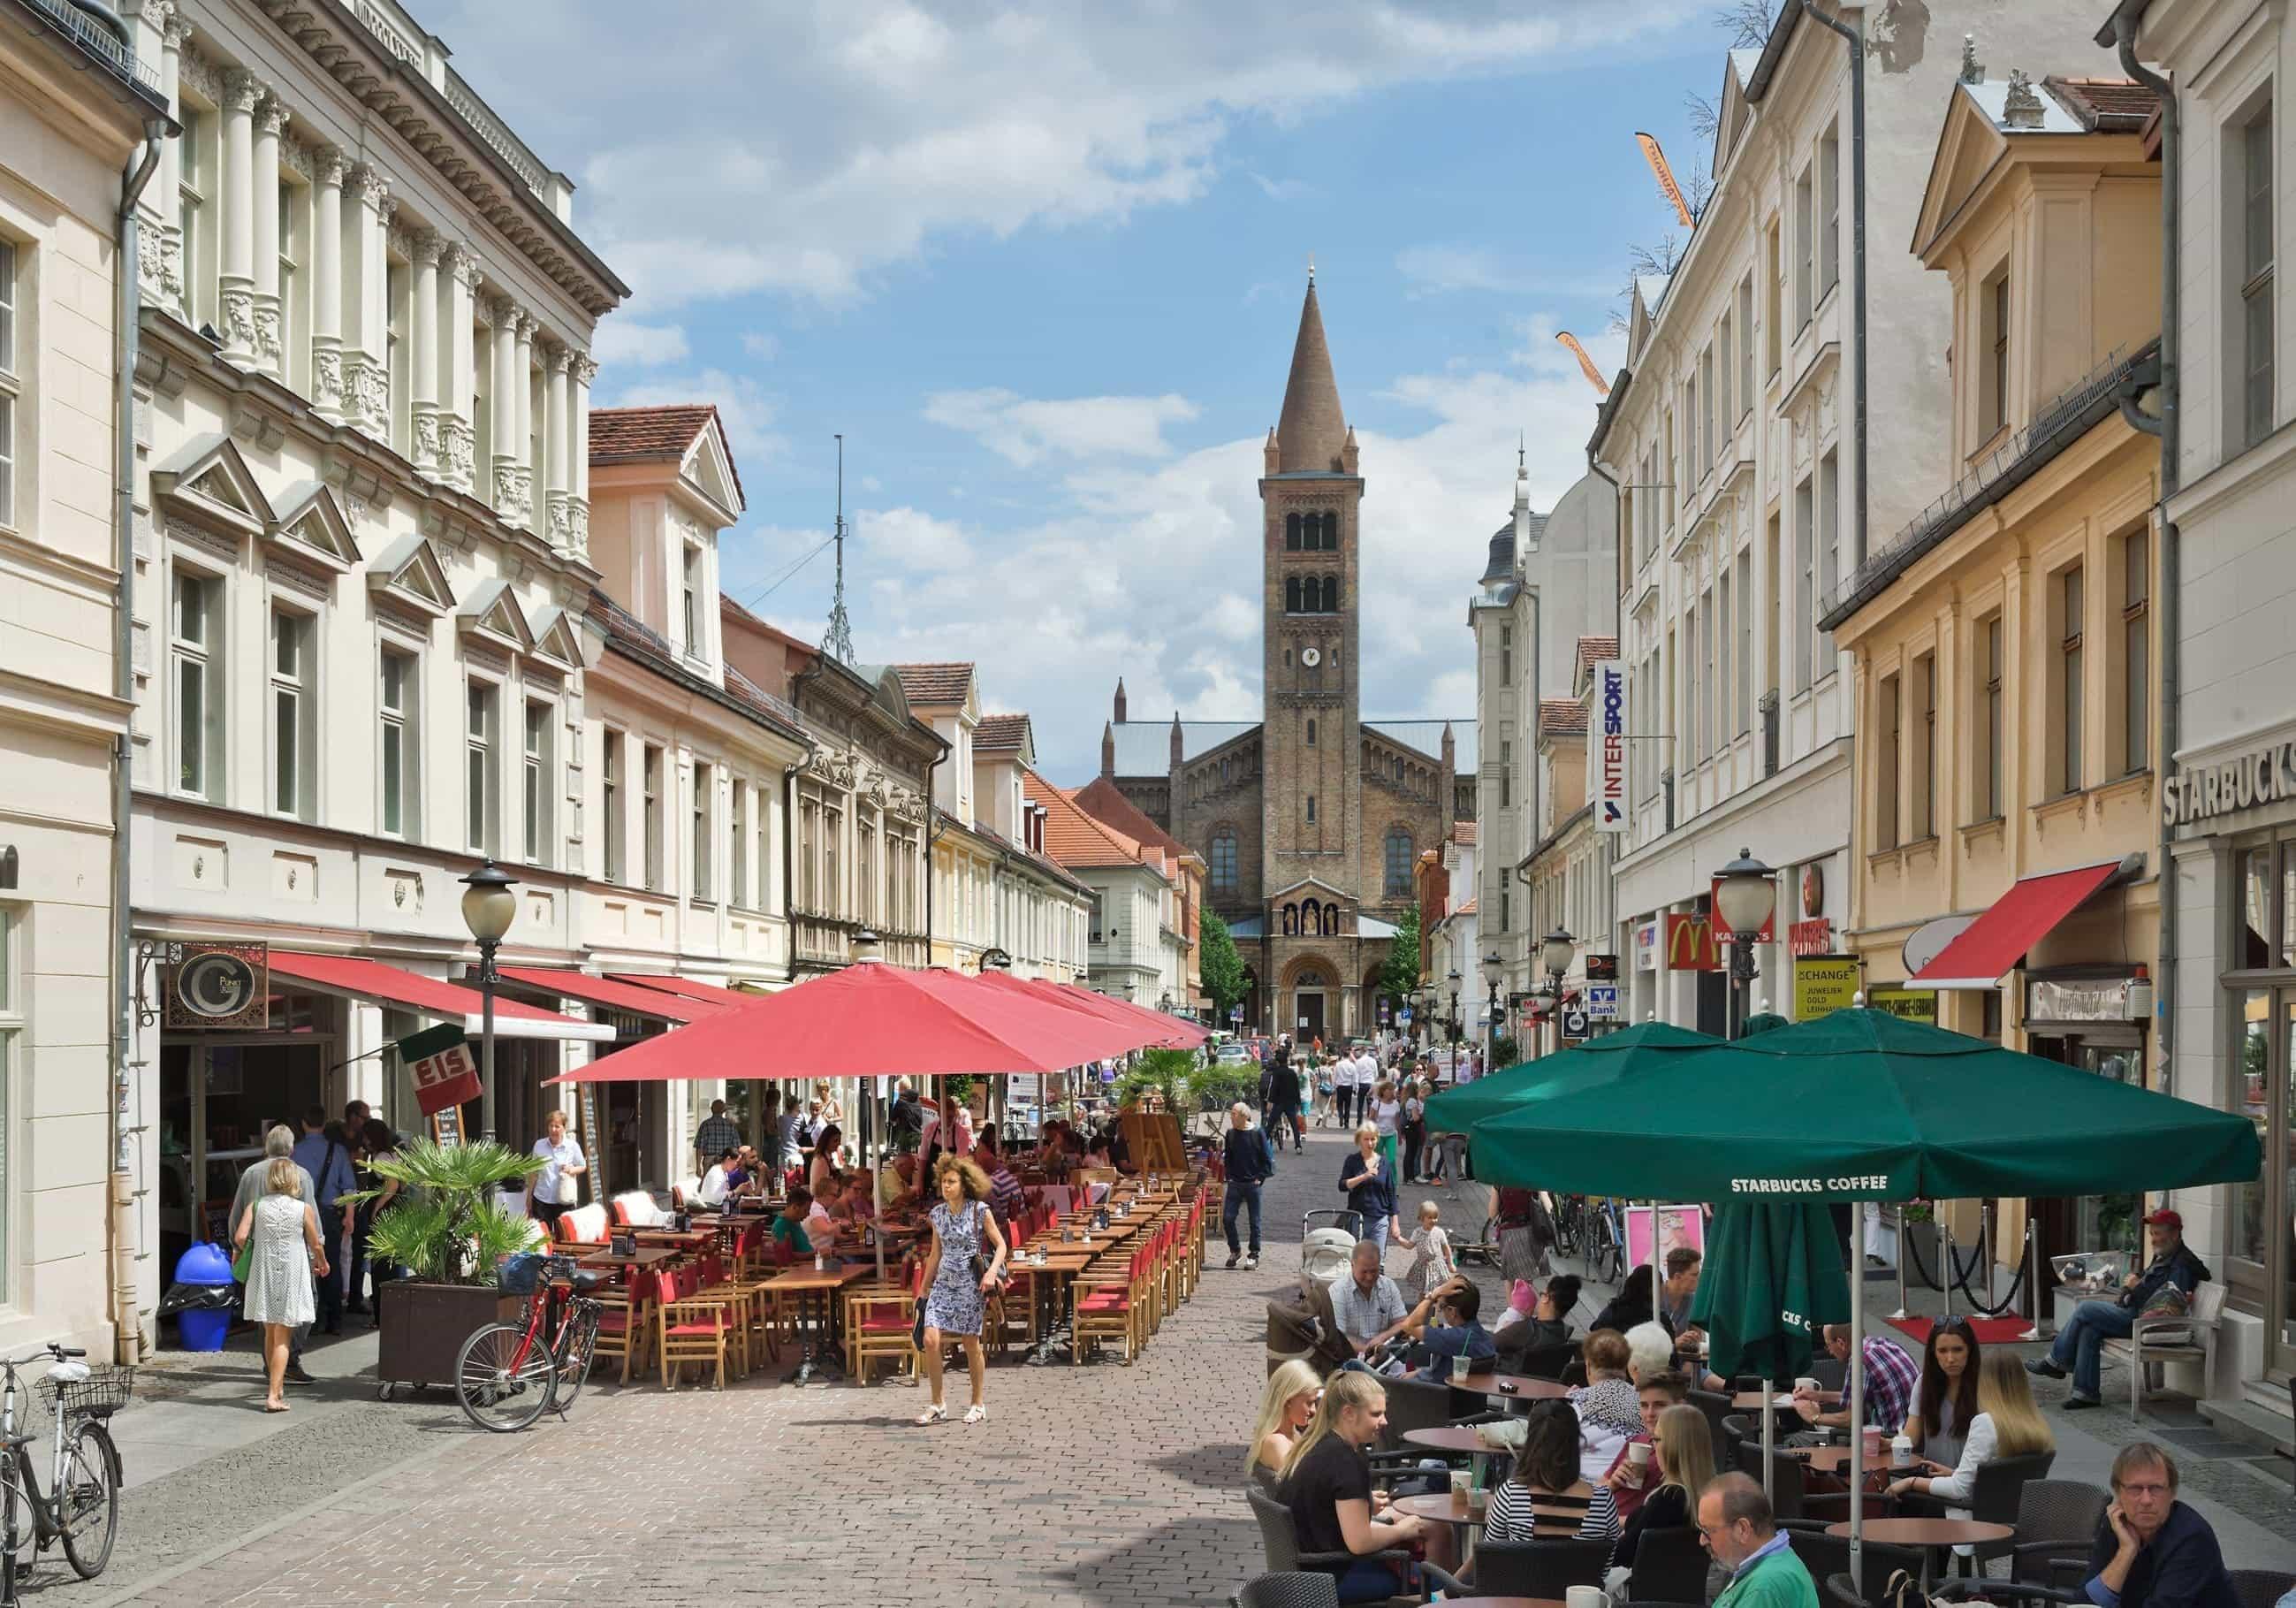 Brandenburger-Strasse in Potsdam